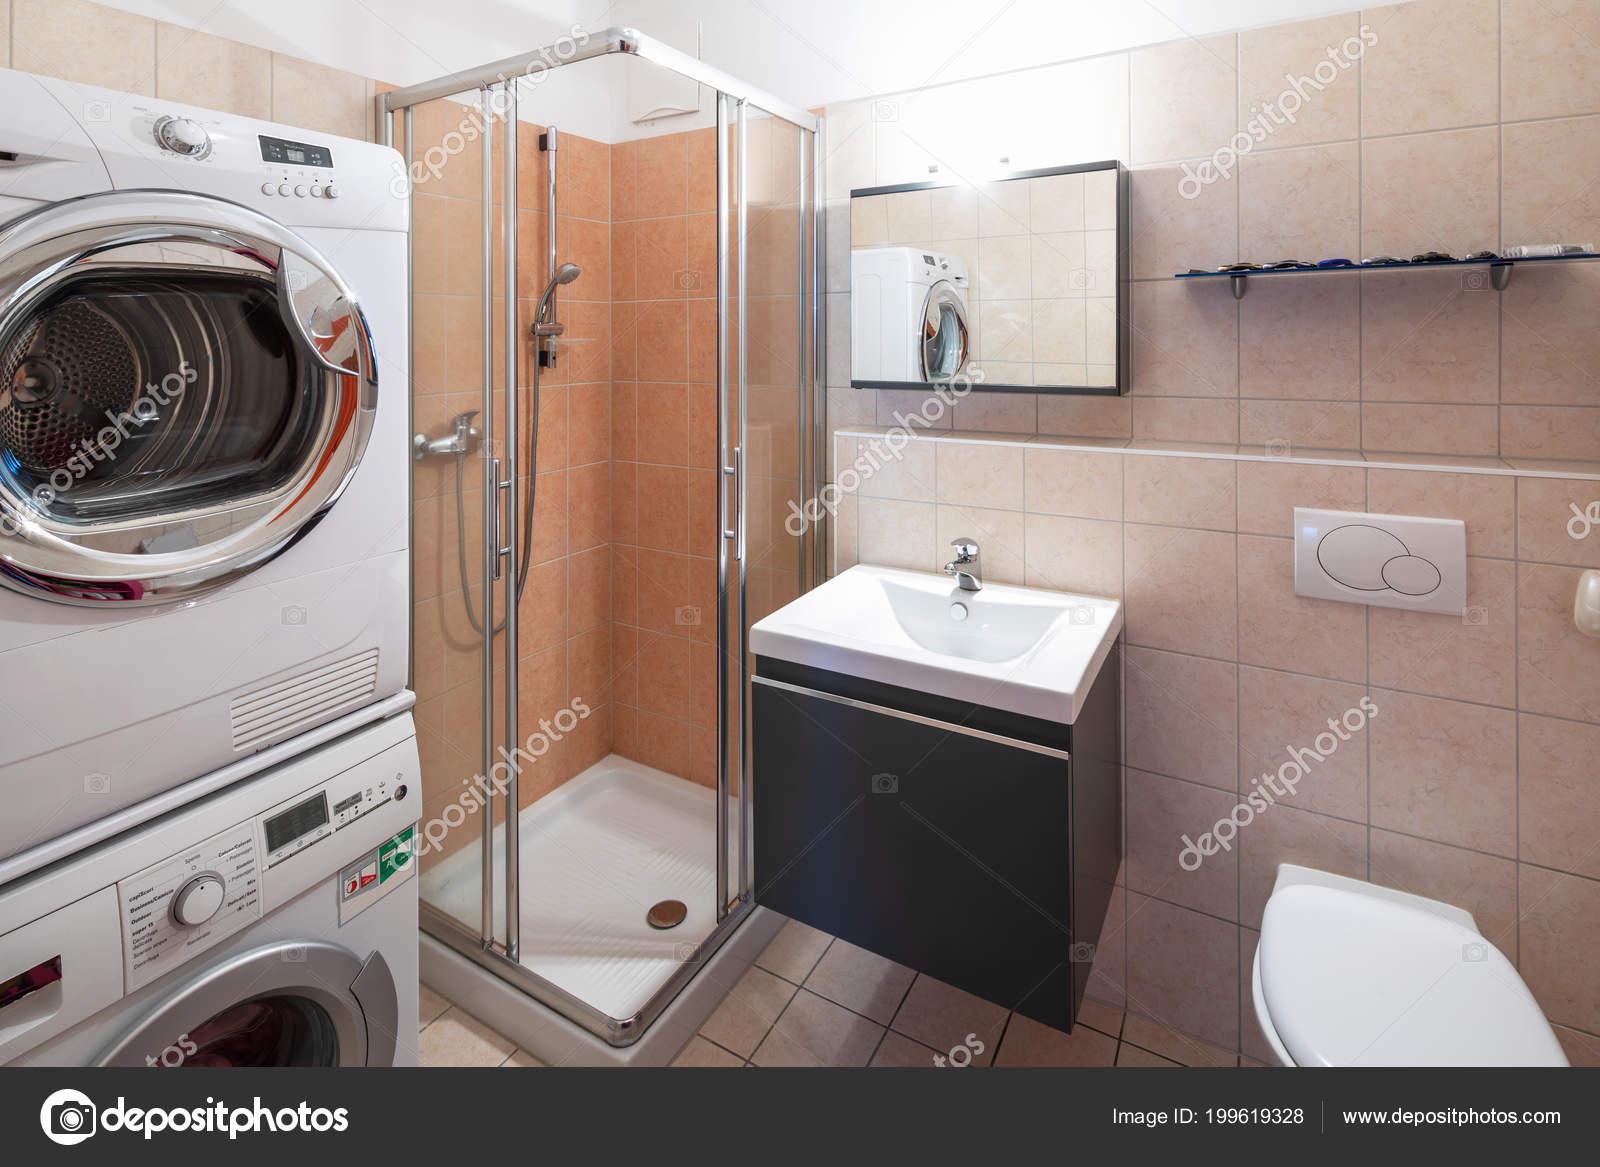 Wasmachine In Badkamer : Moderne badkamer met tegel douche wasmachine droger niemand binnen